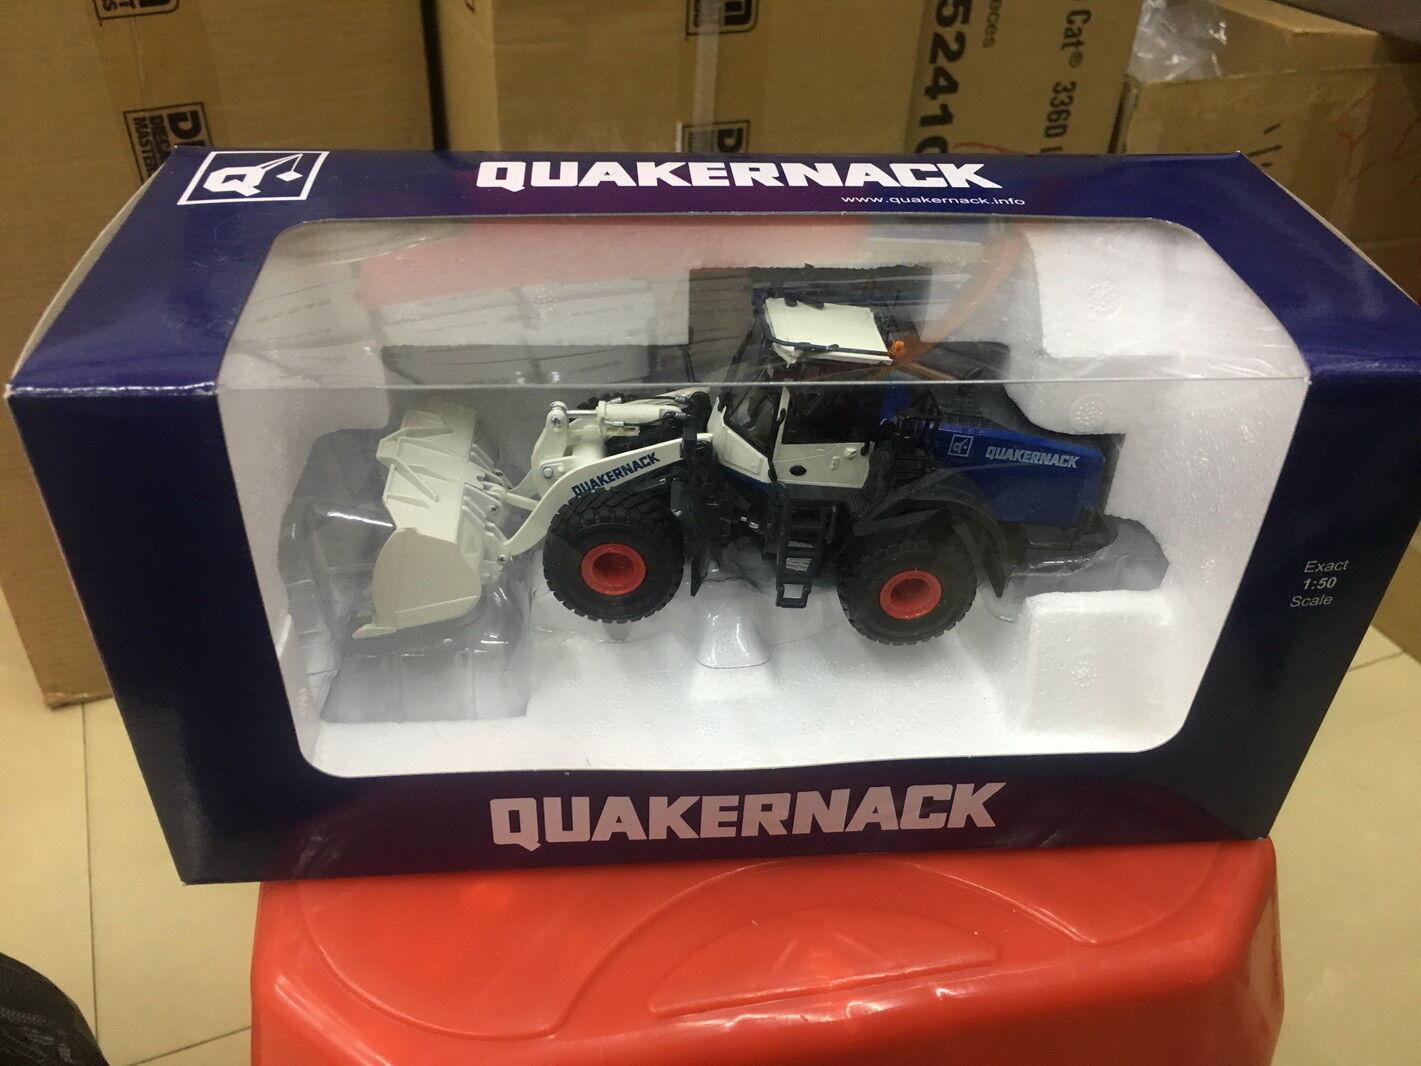 Universal hobbies 1 50 Quakernack Wheel Loader DIECAST MODEL UH8116